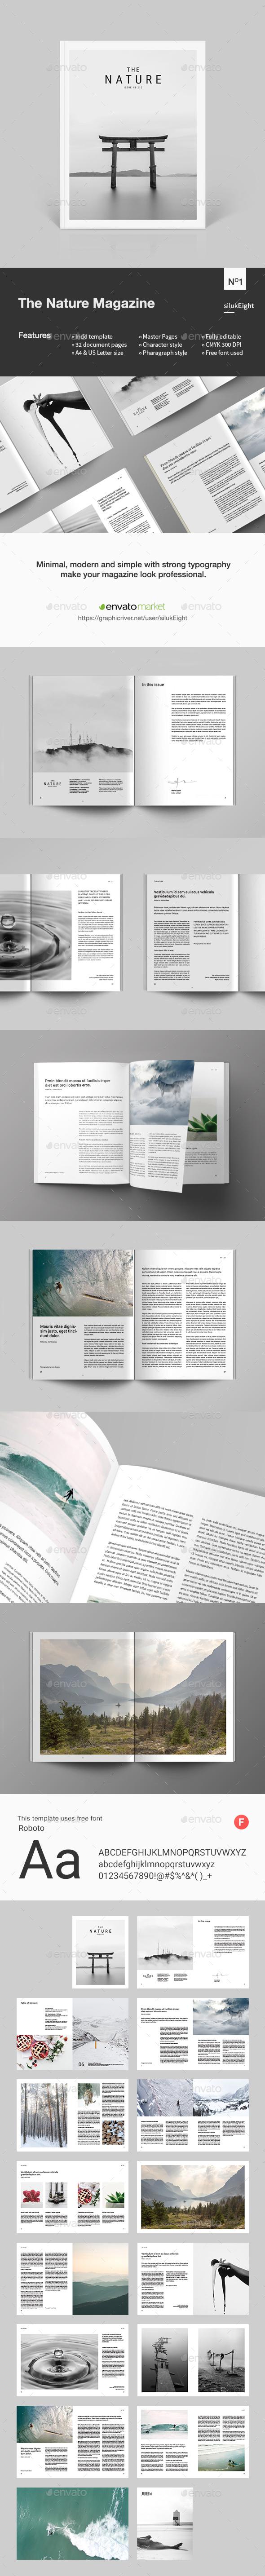 The Nature Magazine - Magazines Print Templates